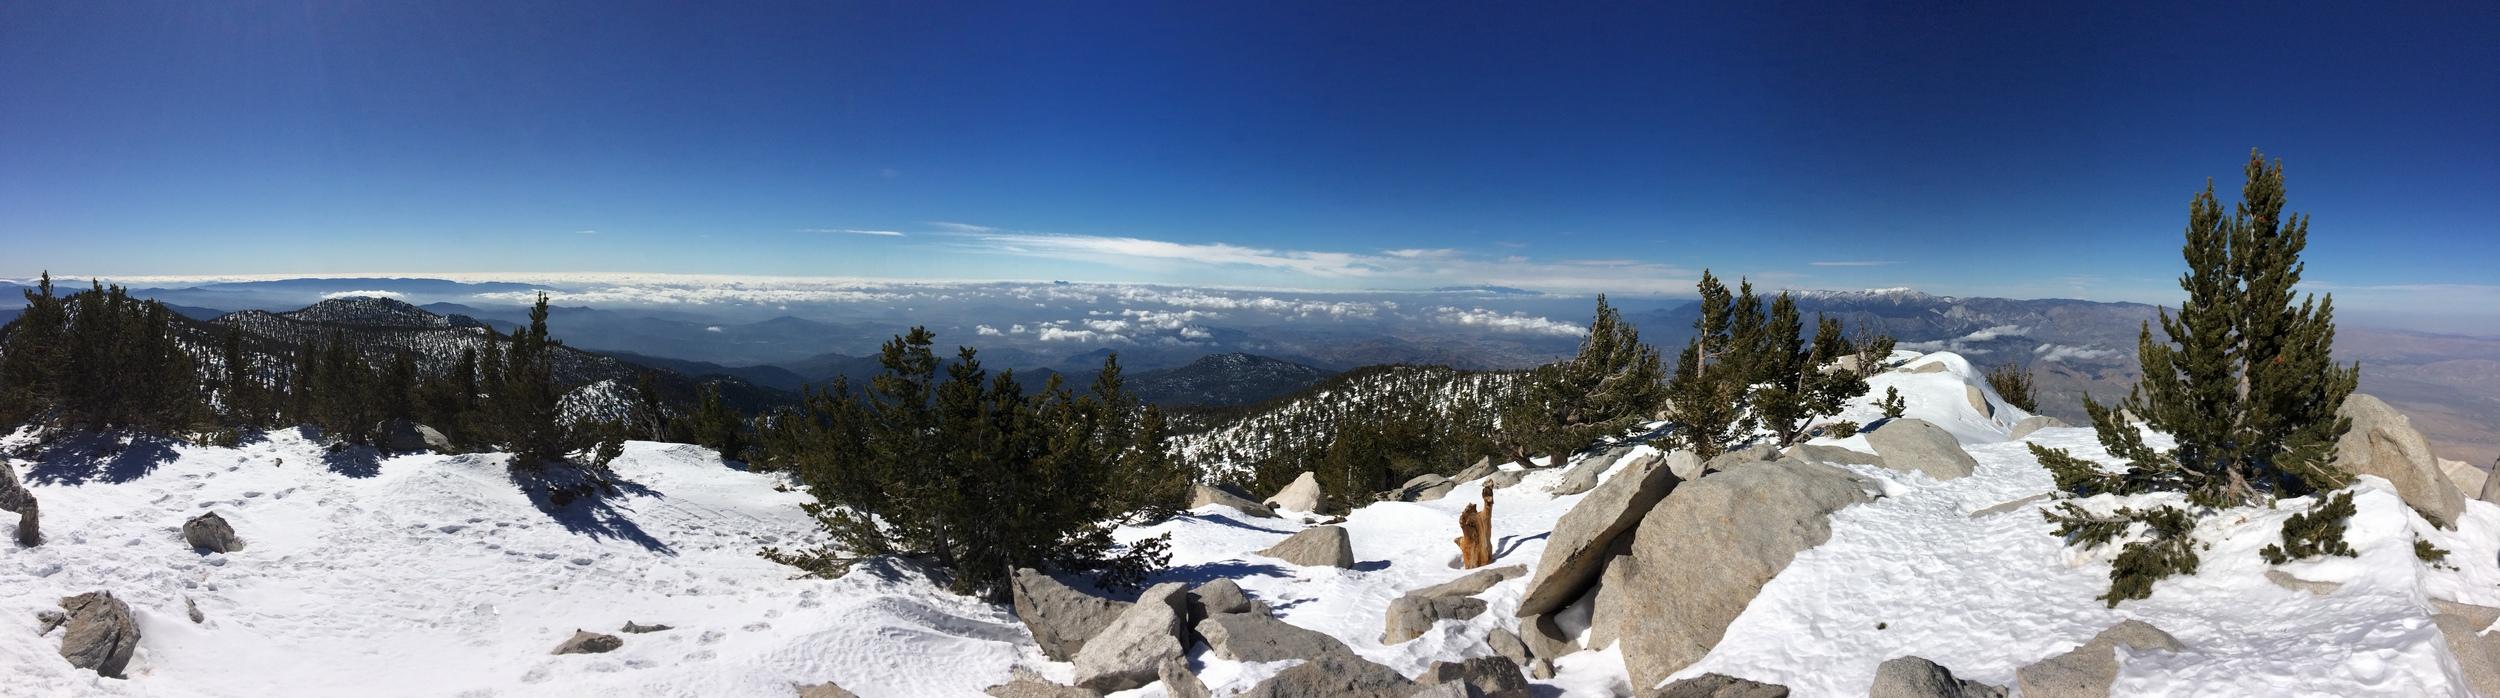 Summit Panorama, Mount San Jacinto, January 2016